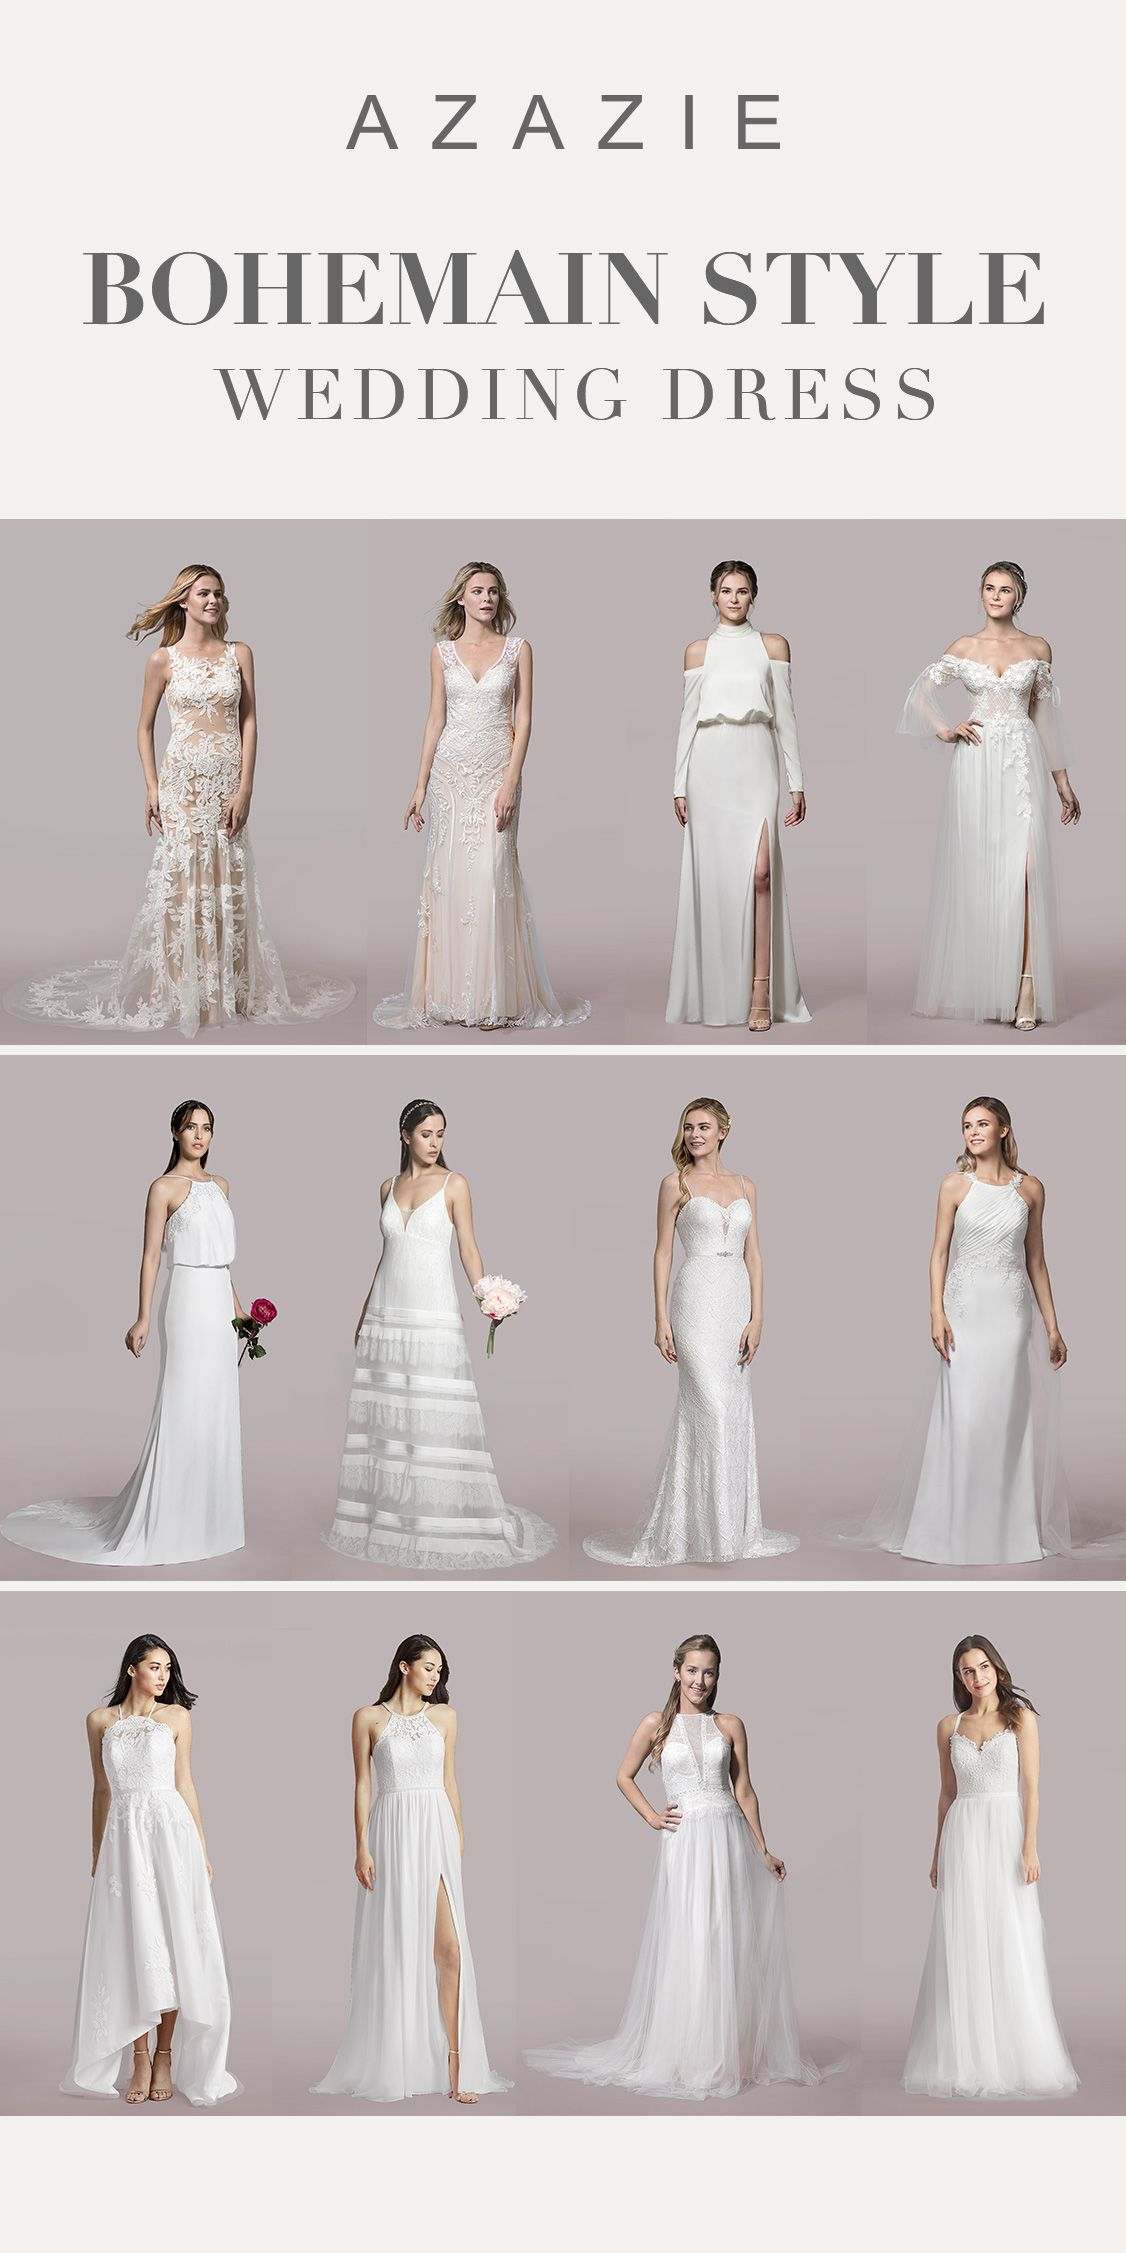 A Boho Wedding Dress Is A Modern And Elegant Choice Bohemian